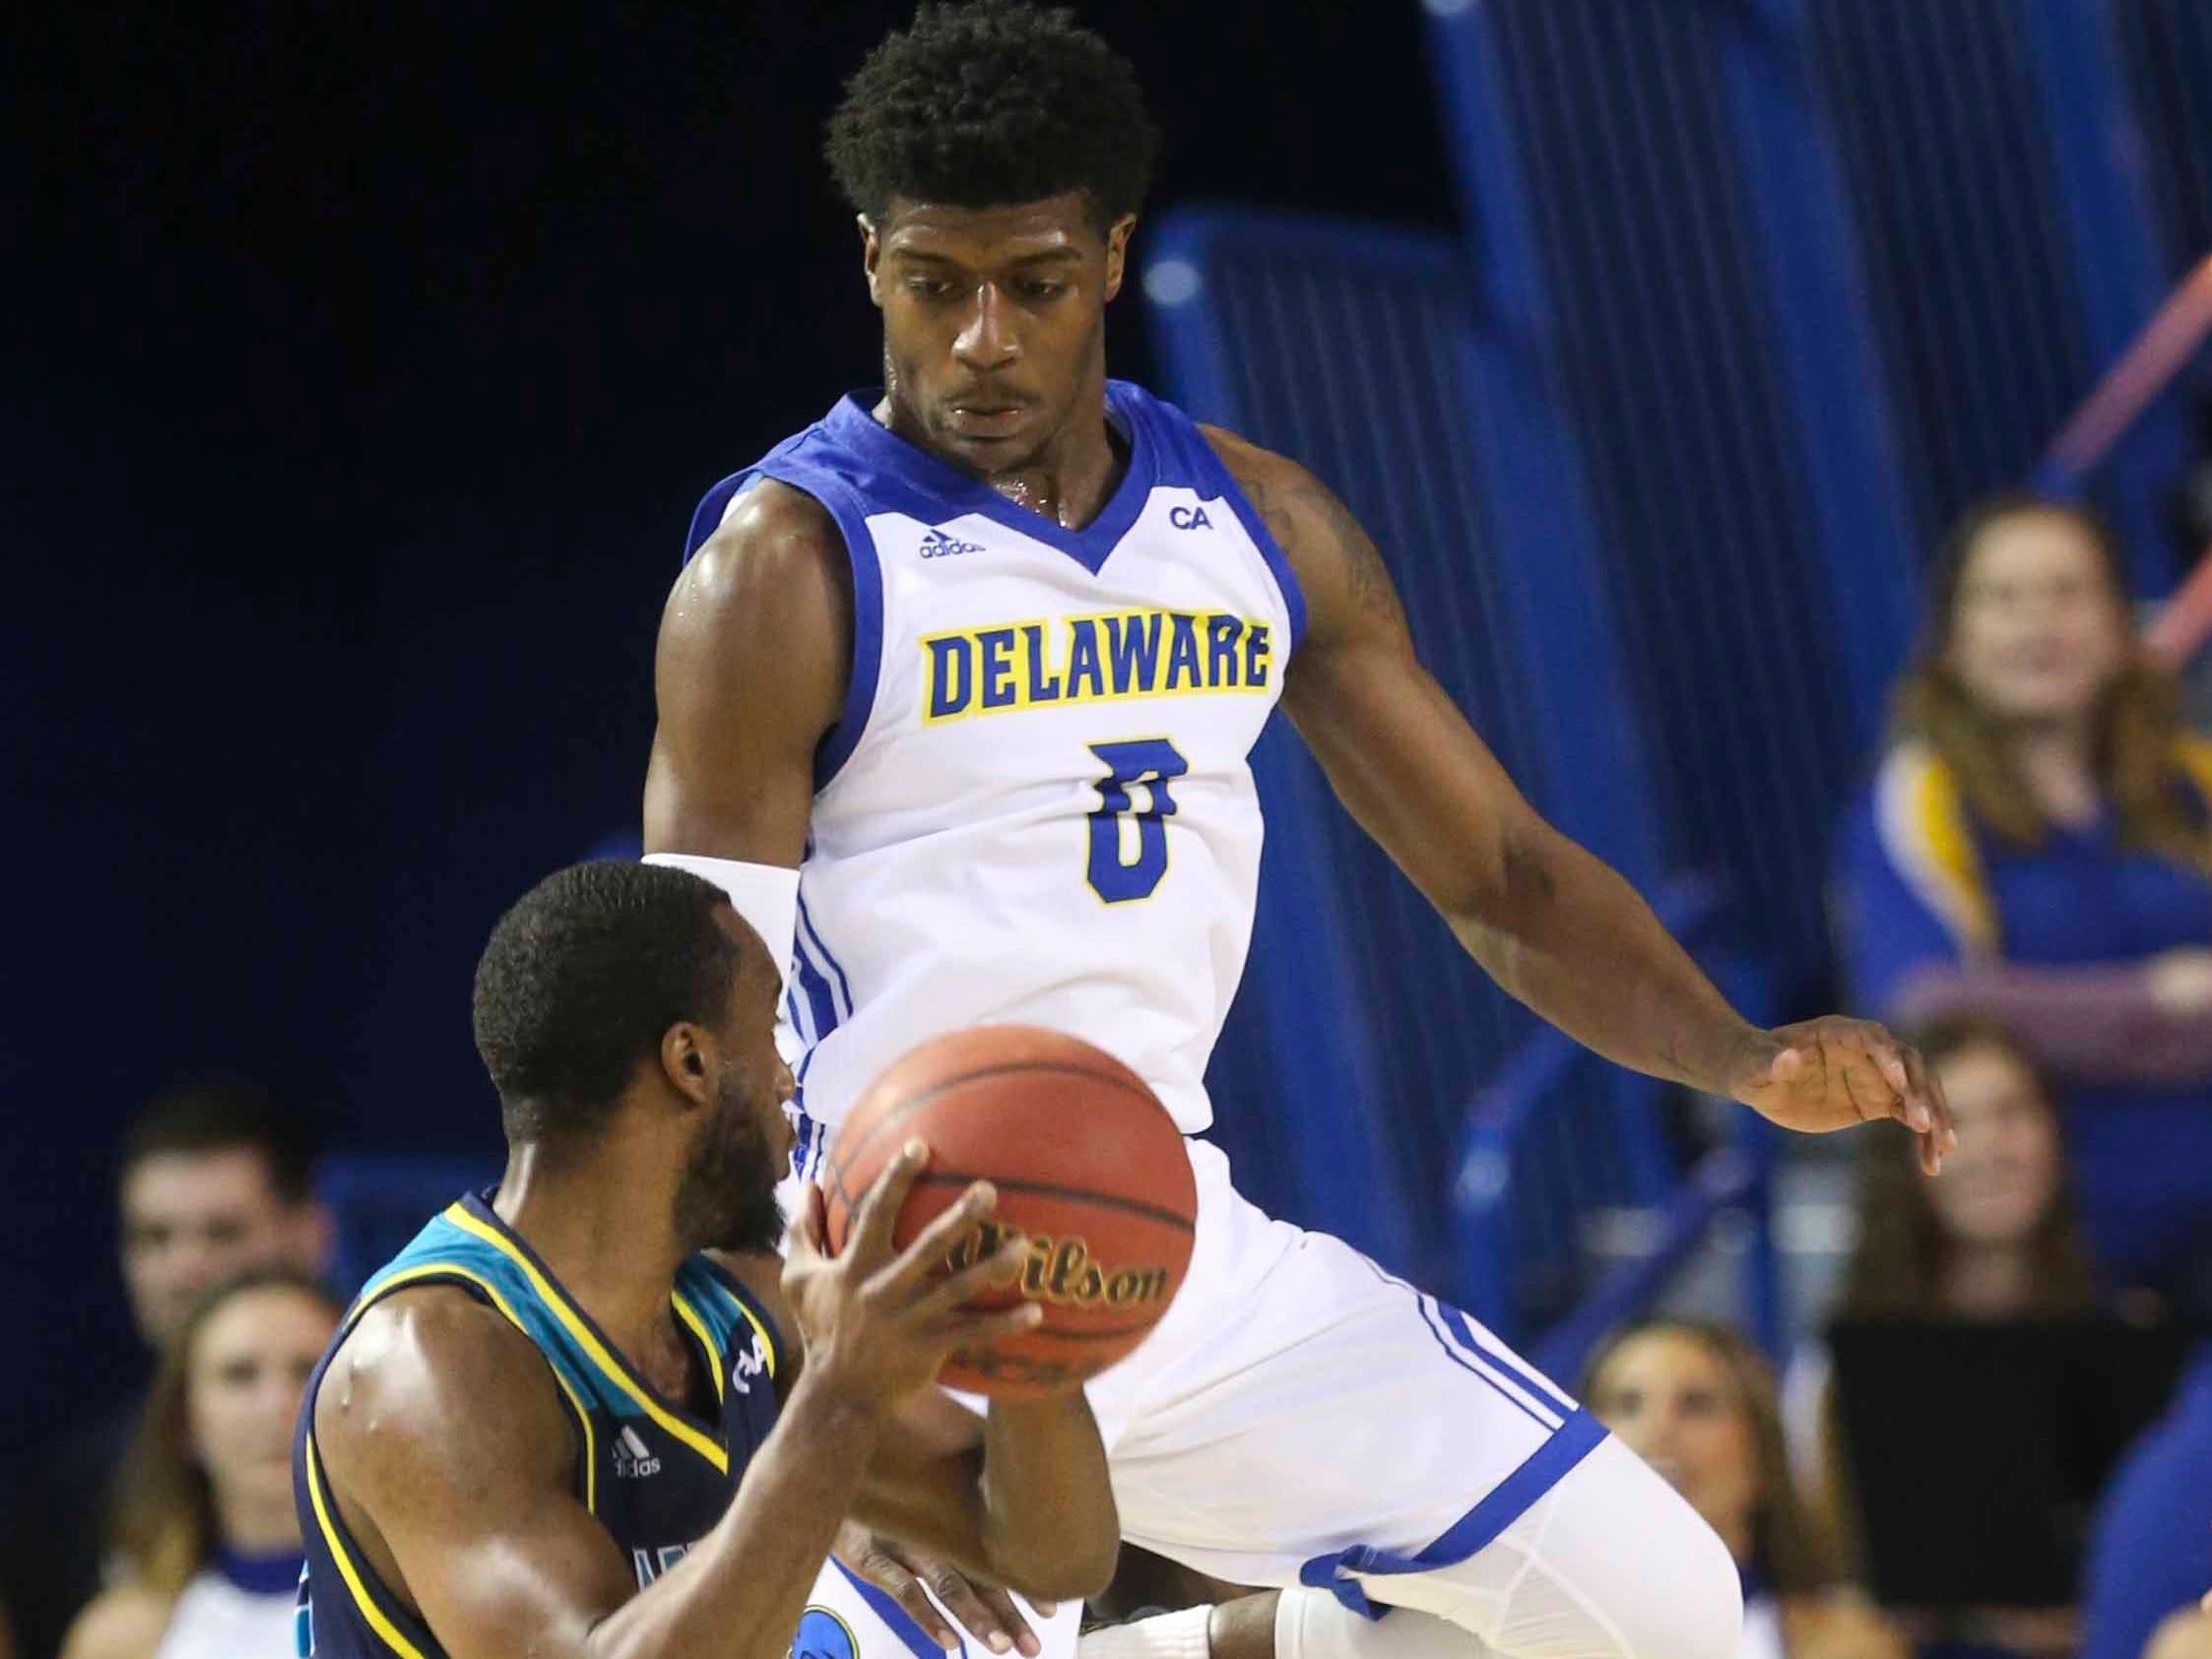 UNC-Wilmington's Ty Taylor draws Delaware's Ryan Allen into leaping on a shot fake in the second half of Delaware's 70-66 win at the Bob Carpenter Center Saturday.